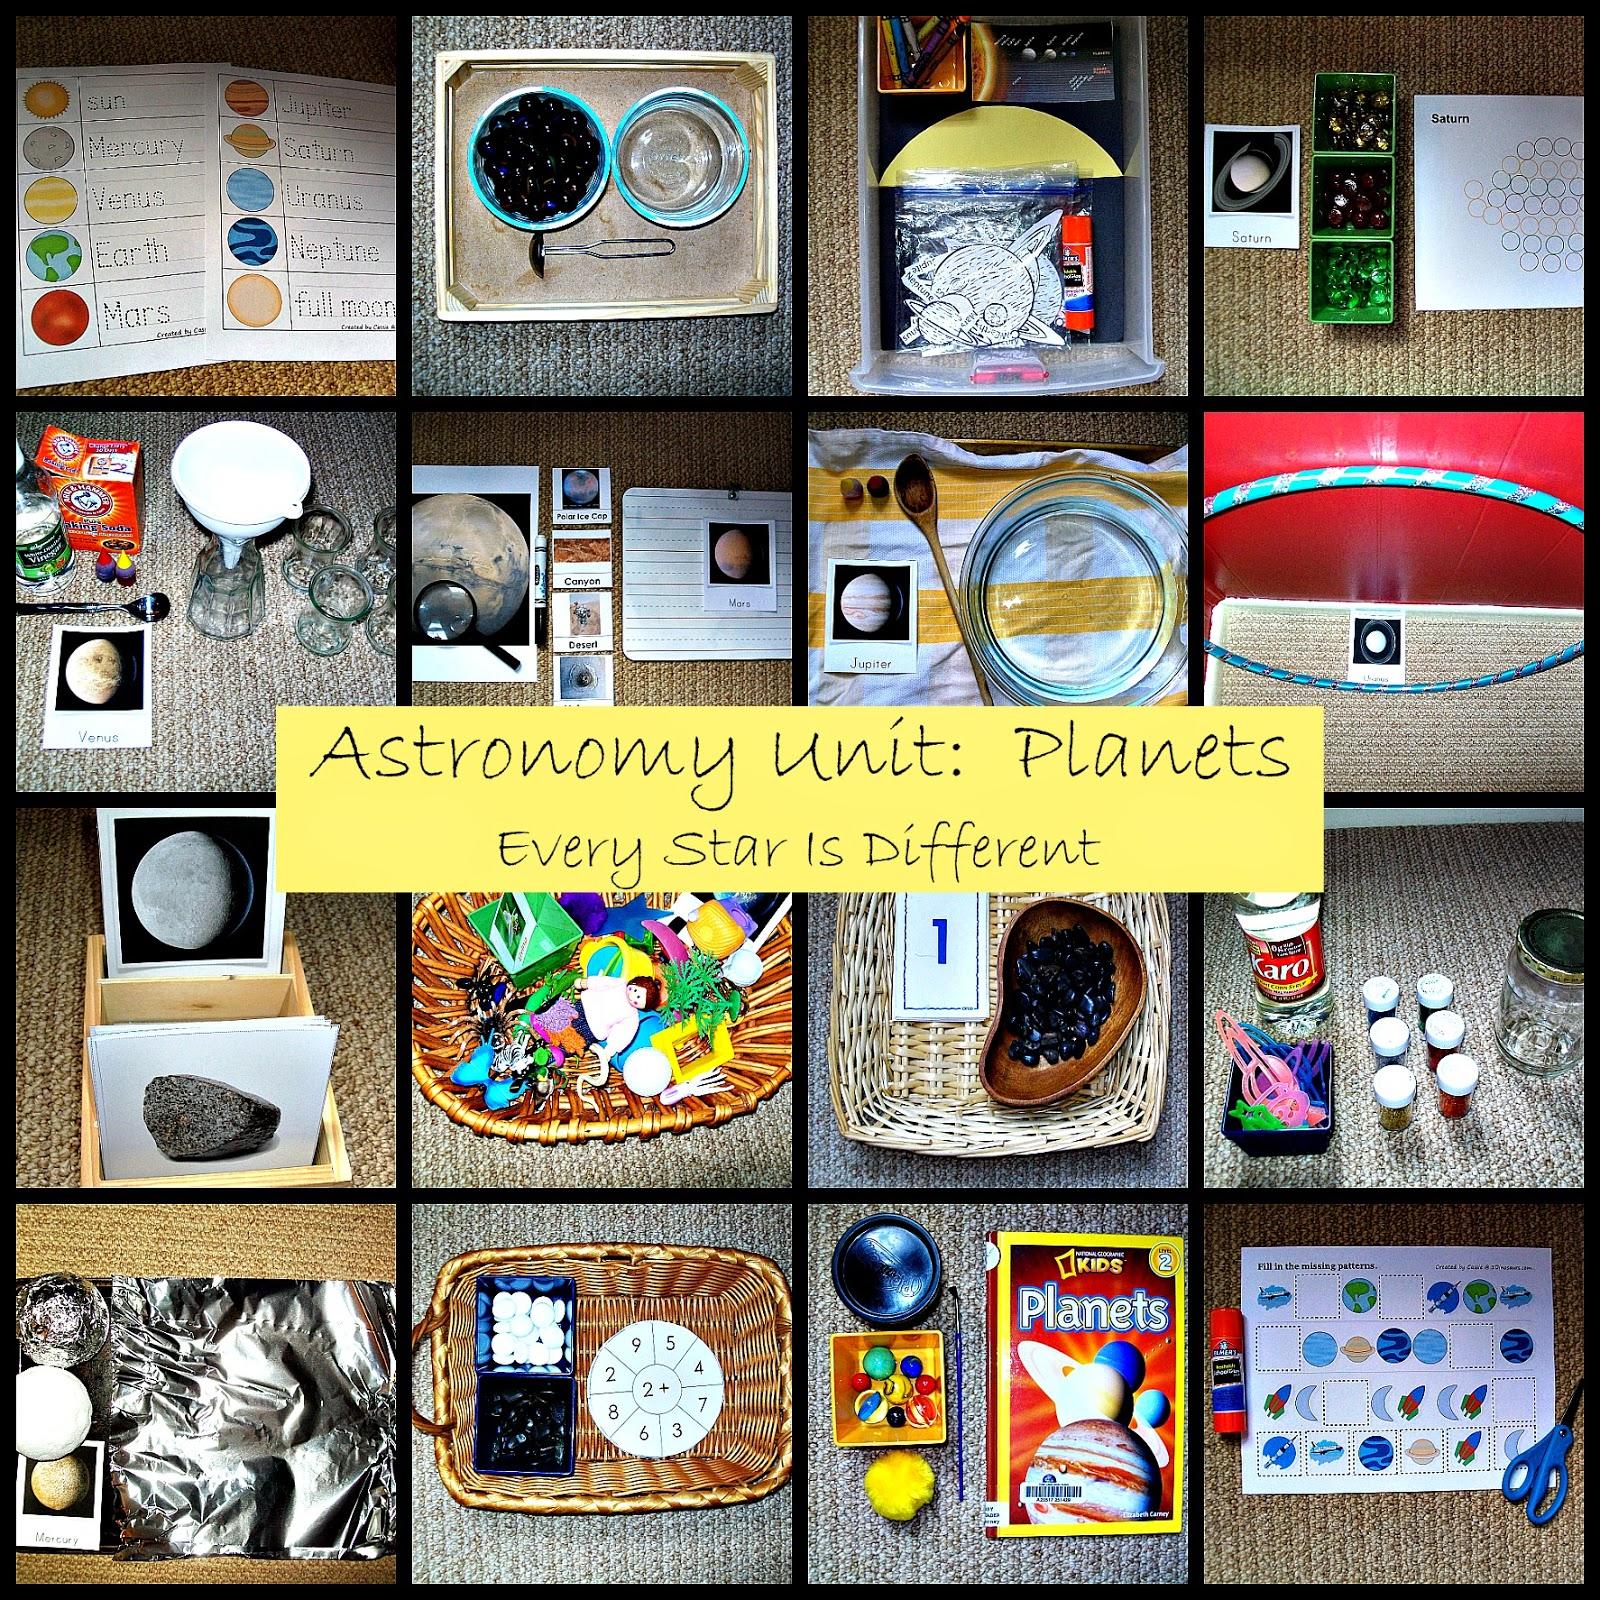 Astronomy Unit: Planets